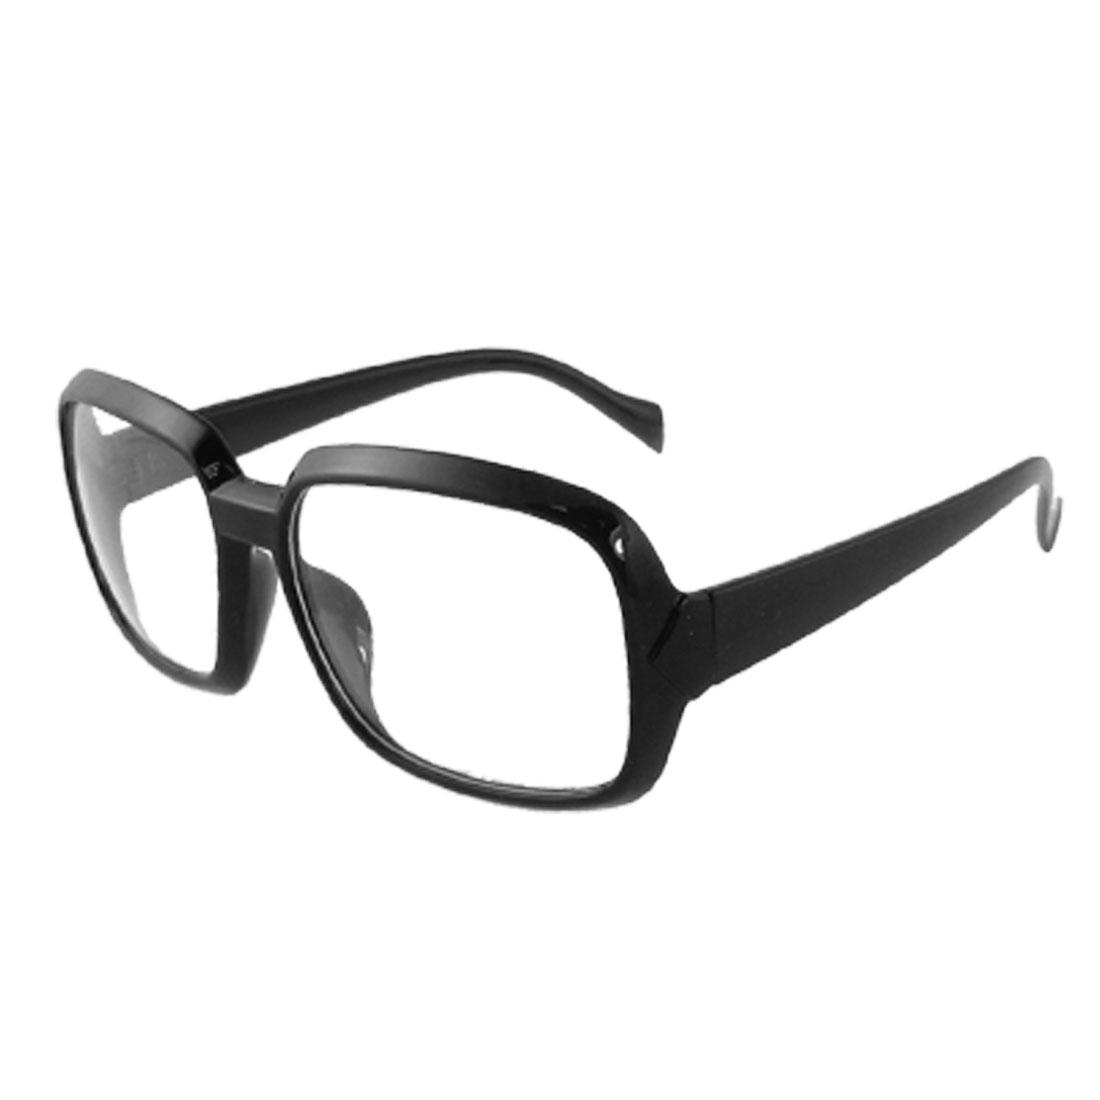 Woman Black Plastic Arms Full Frame Clear Lens Plano Glasses